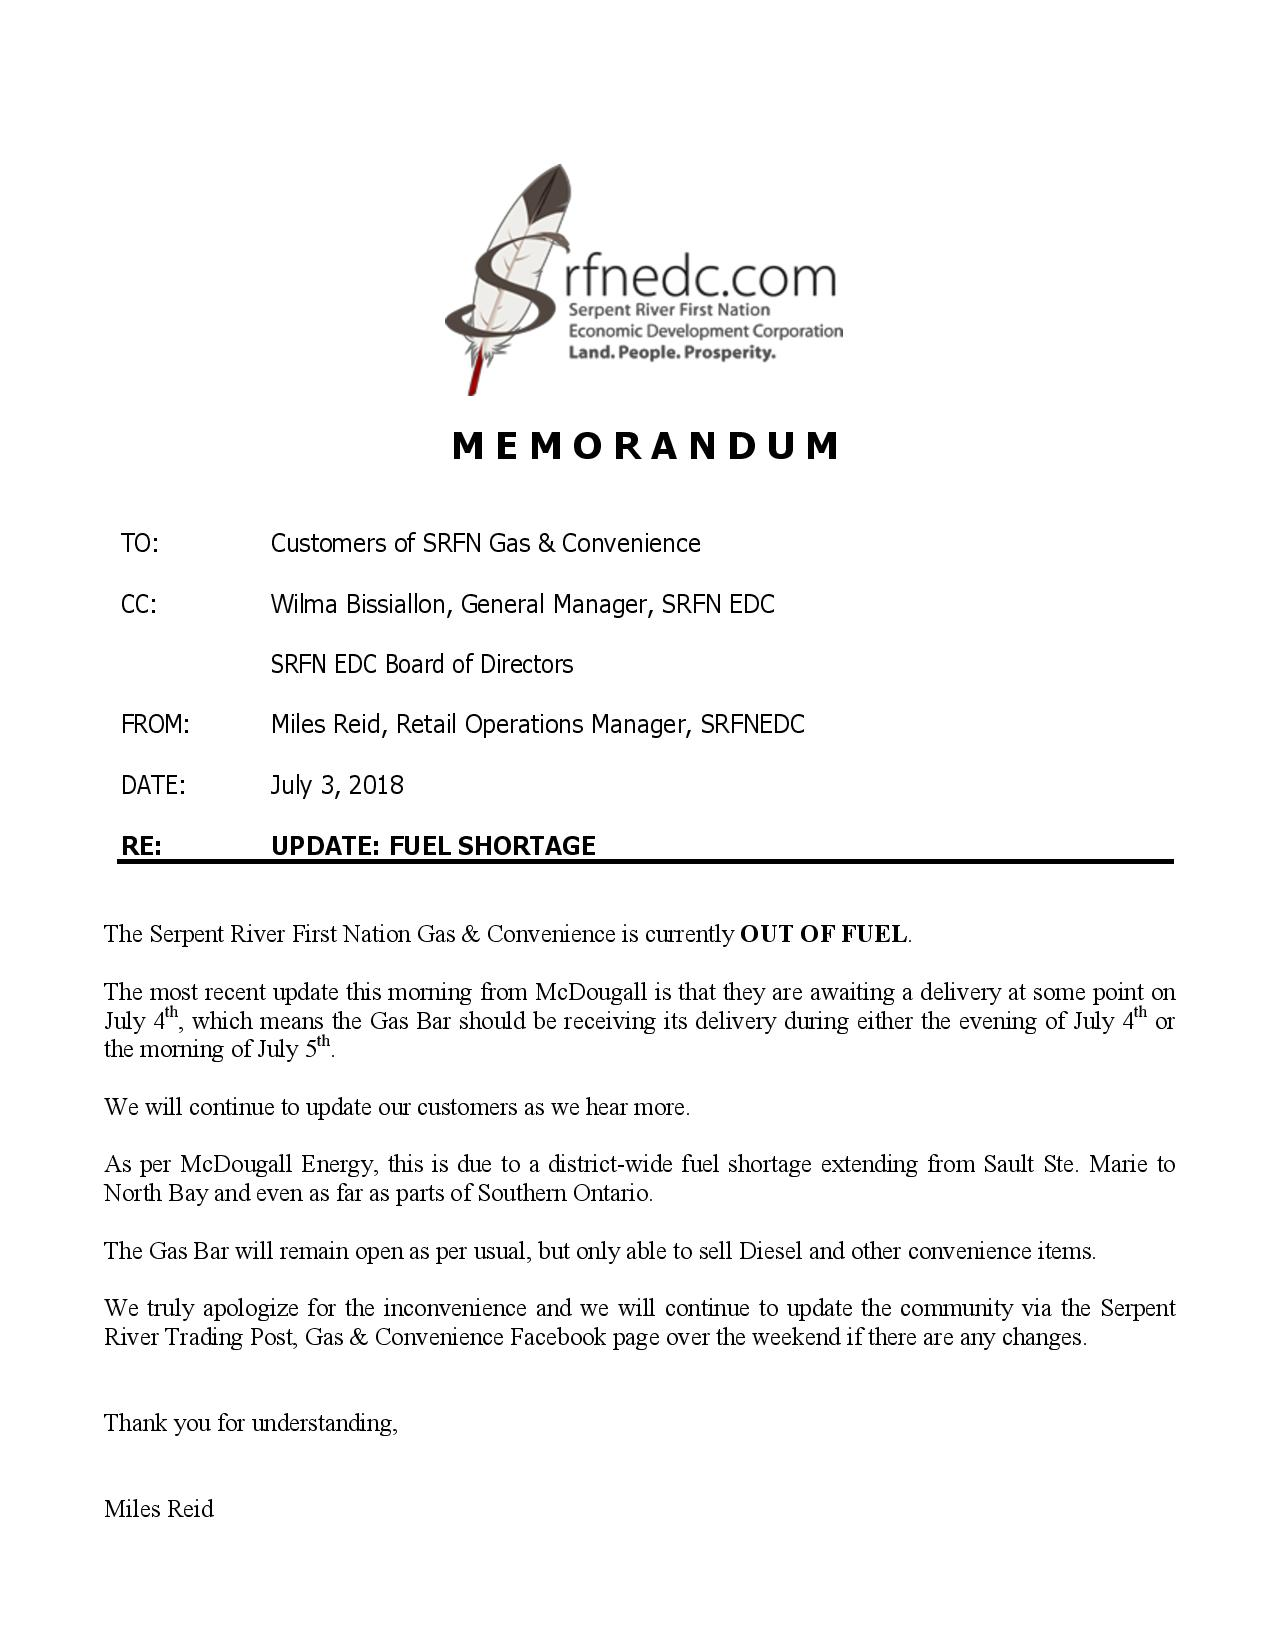 Memo - Fuel Shortage Update July 3-page-001.jpg